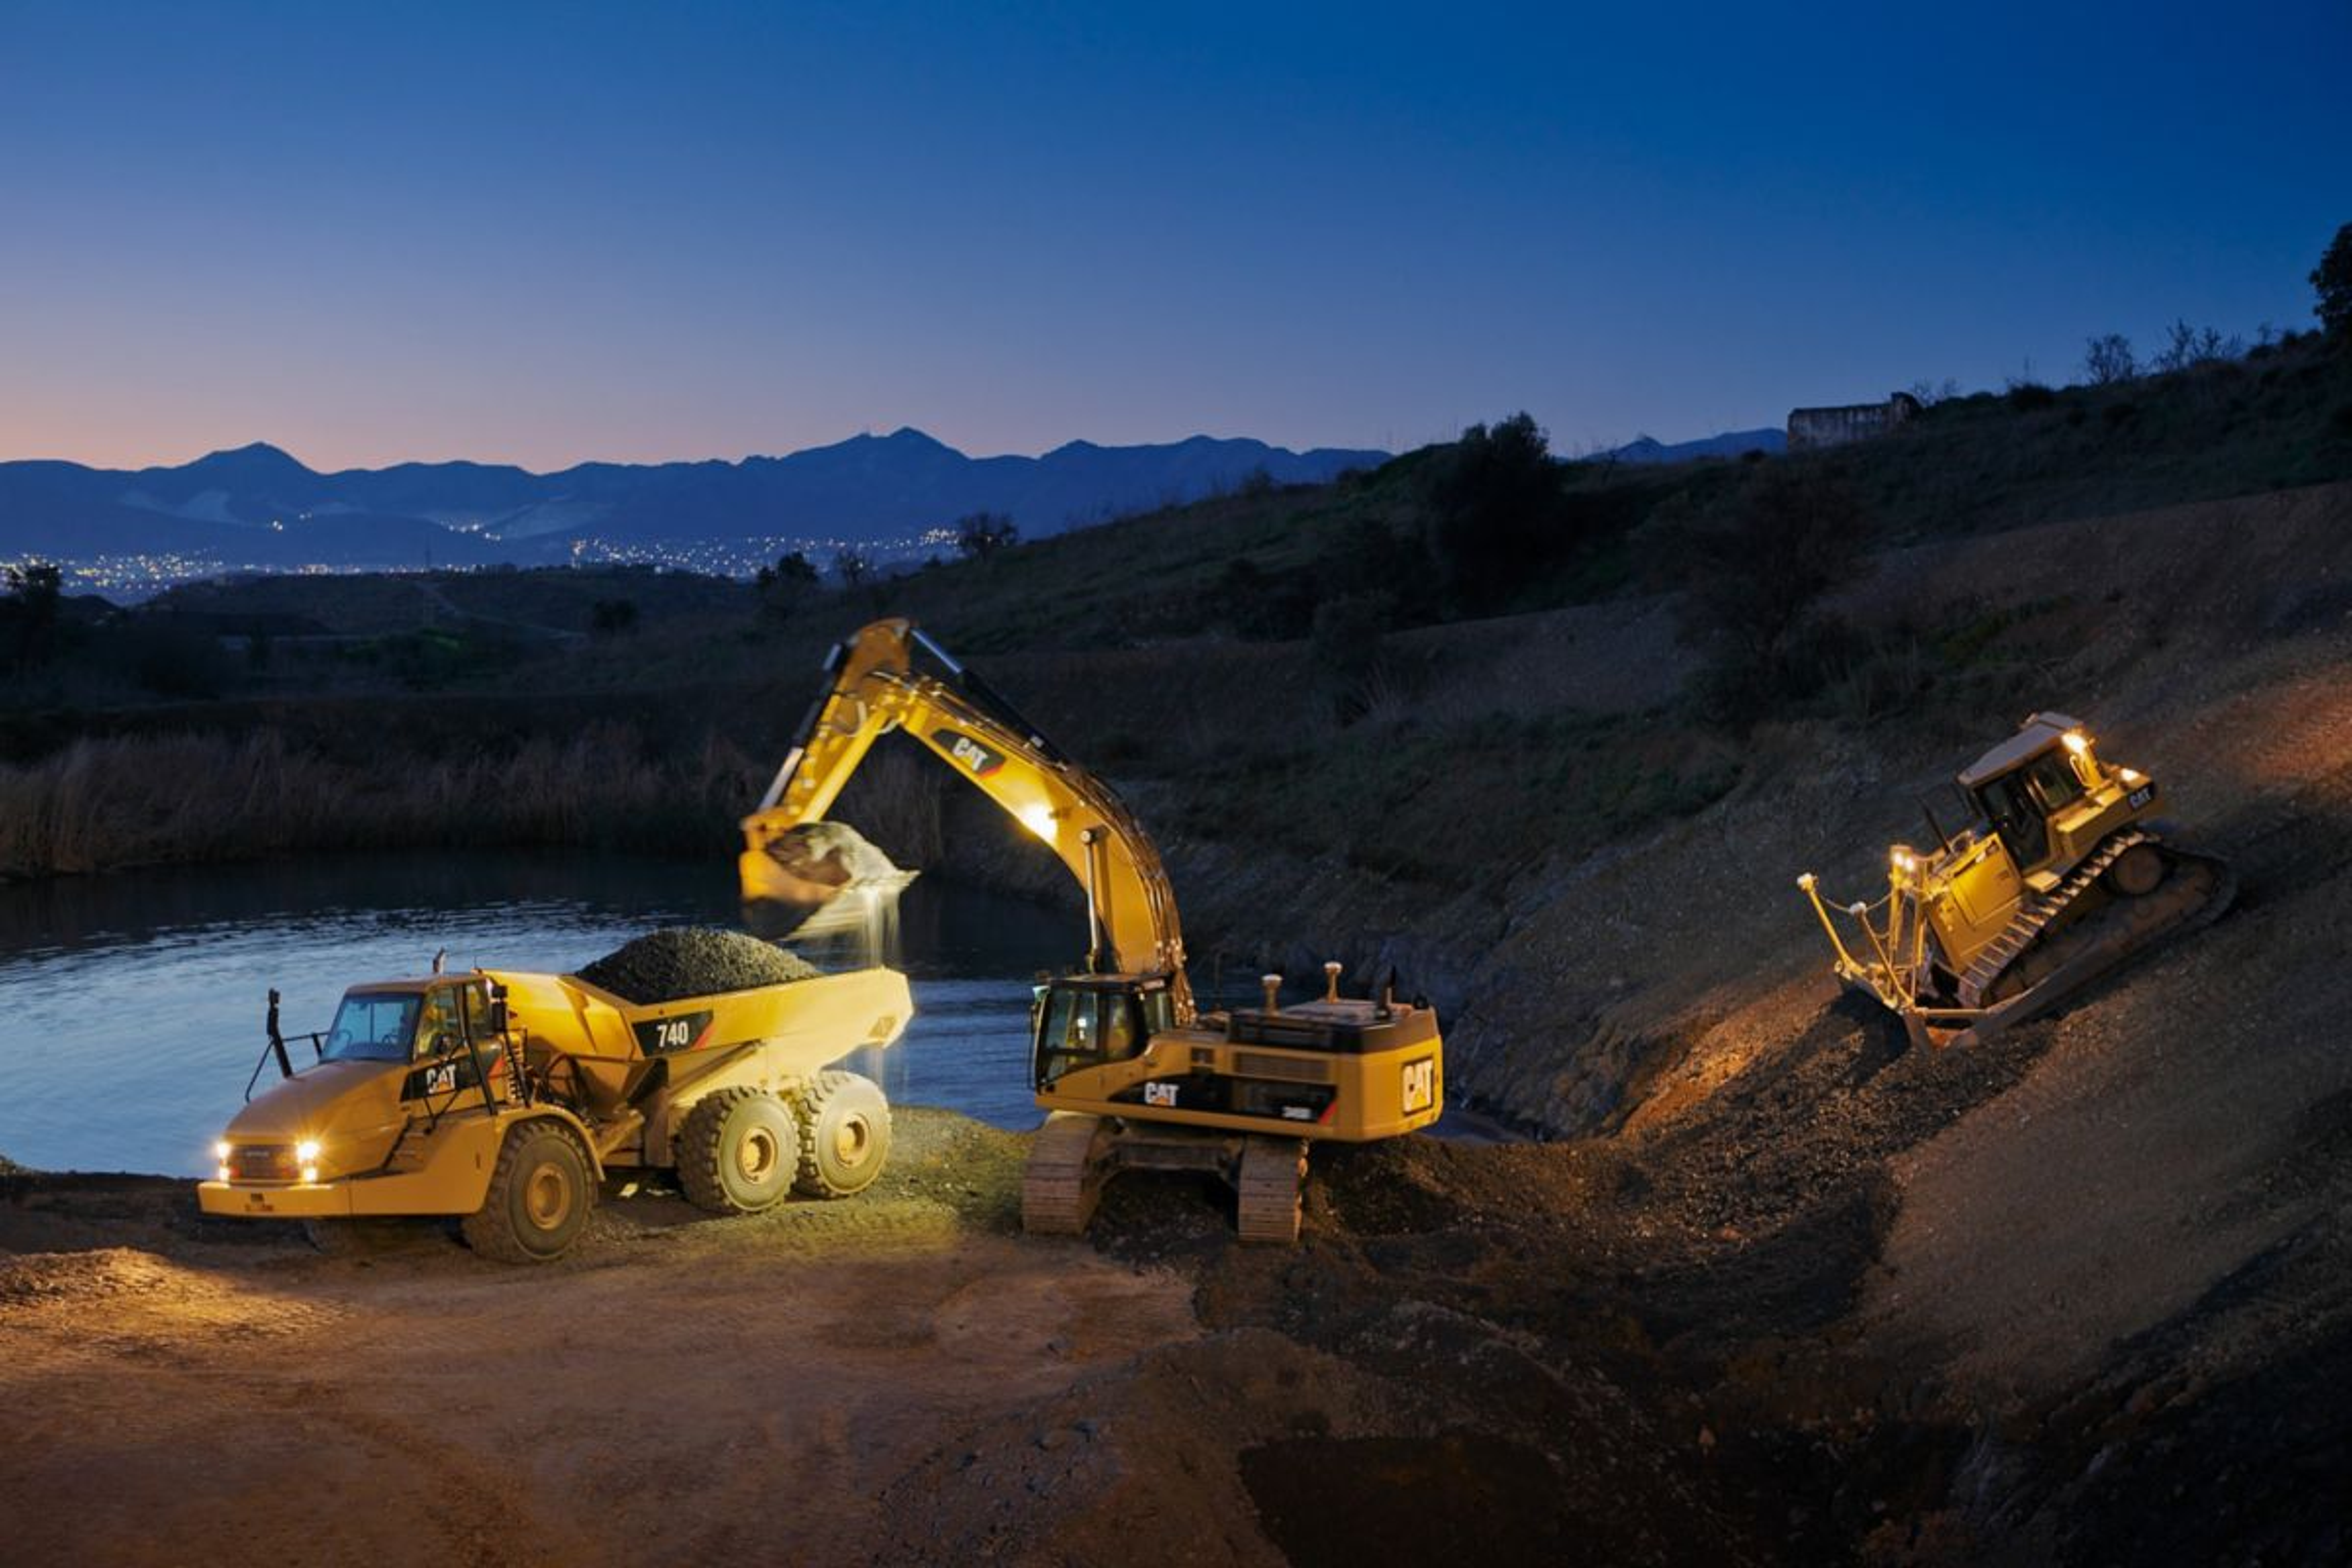 job site at night